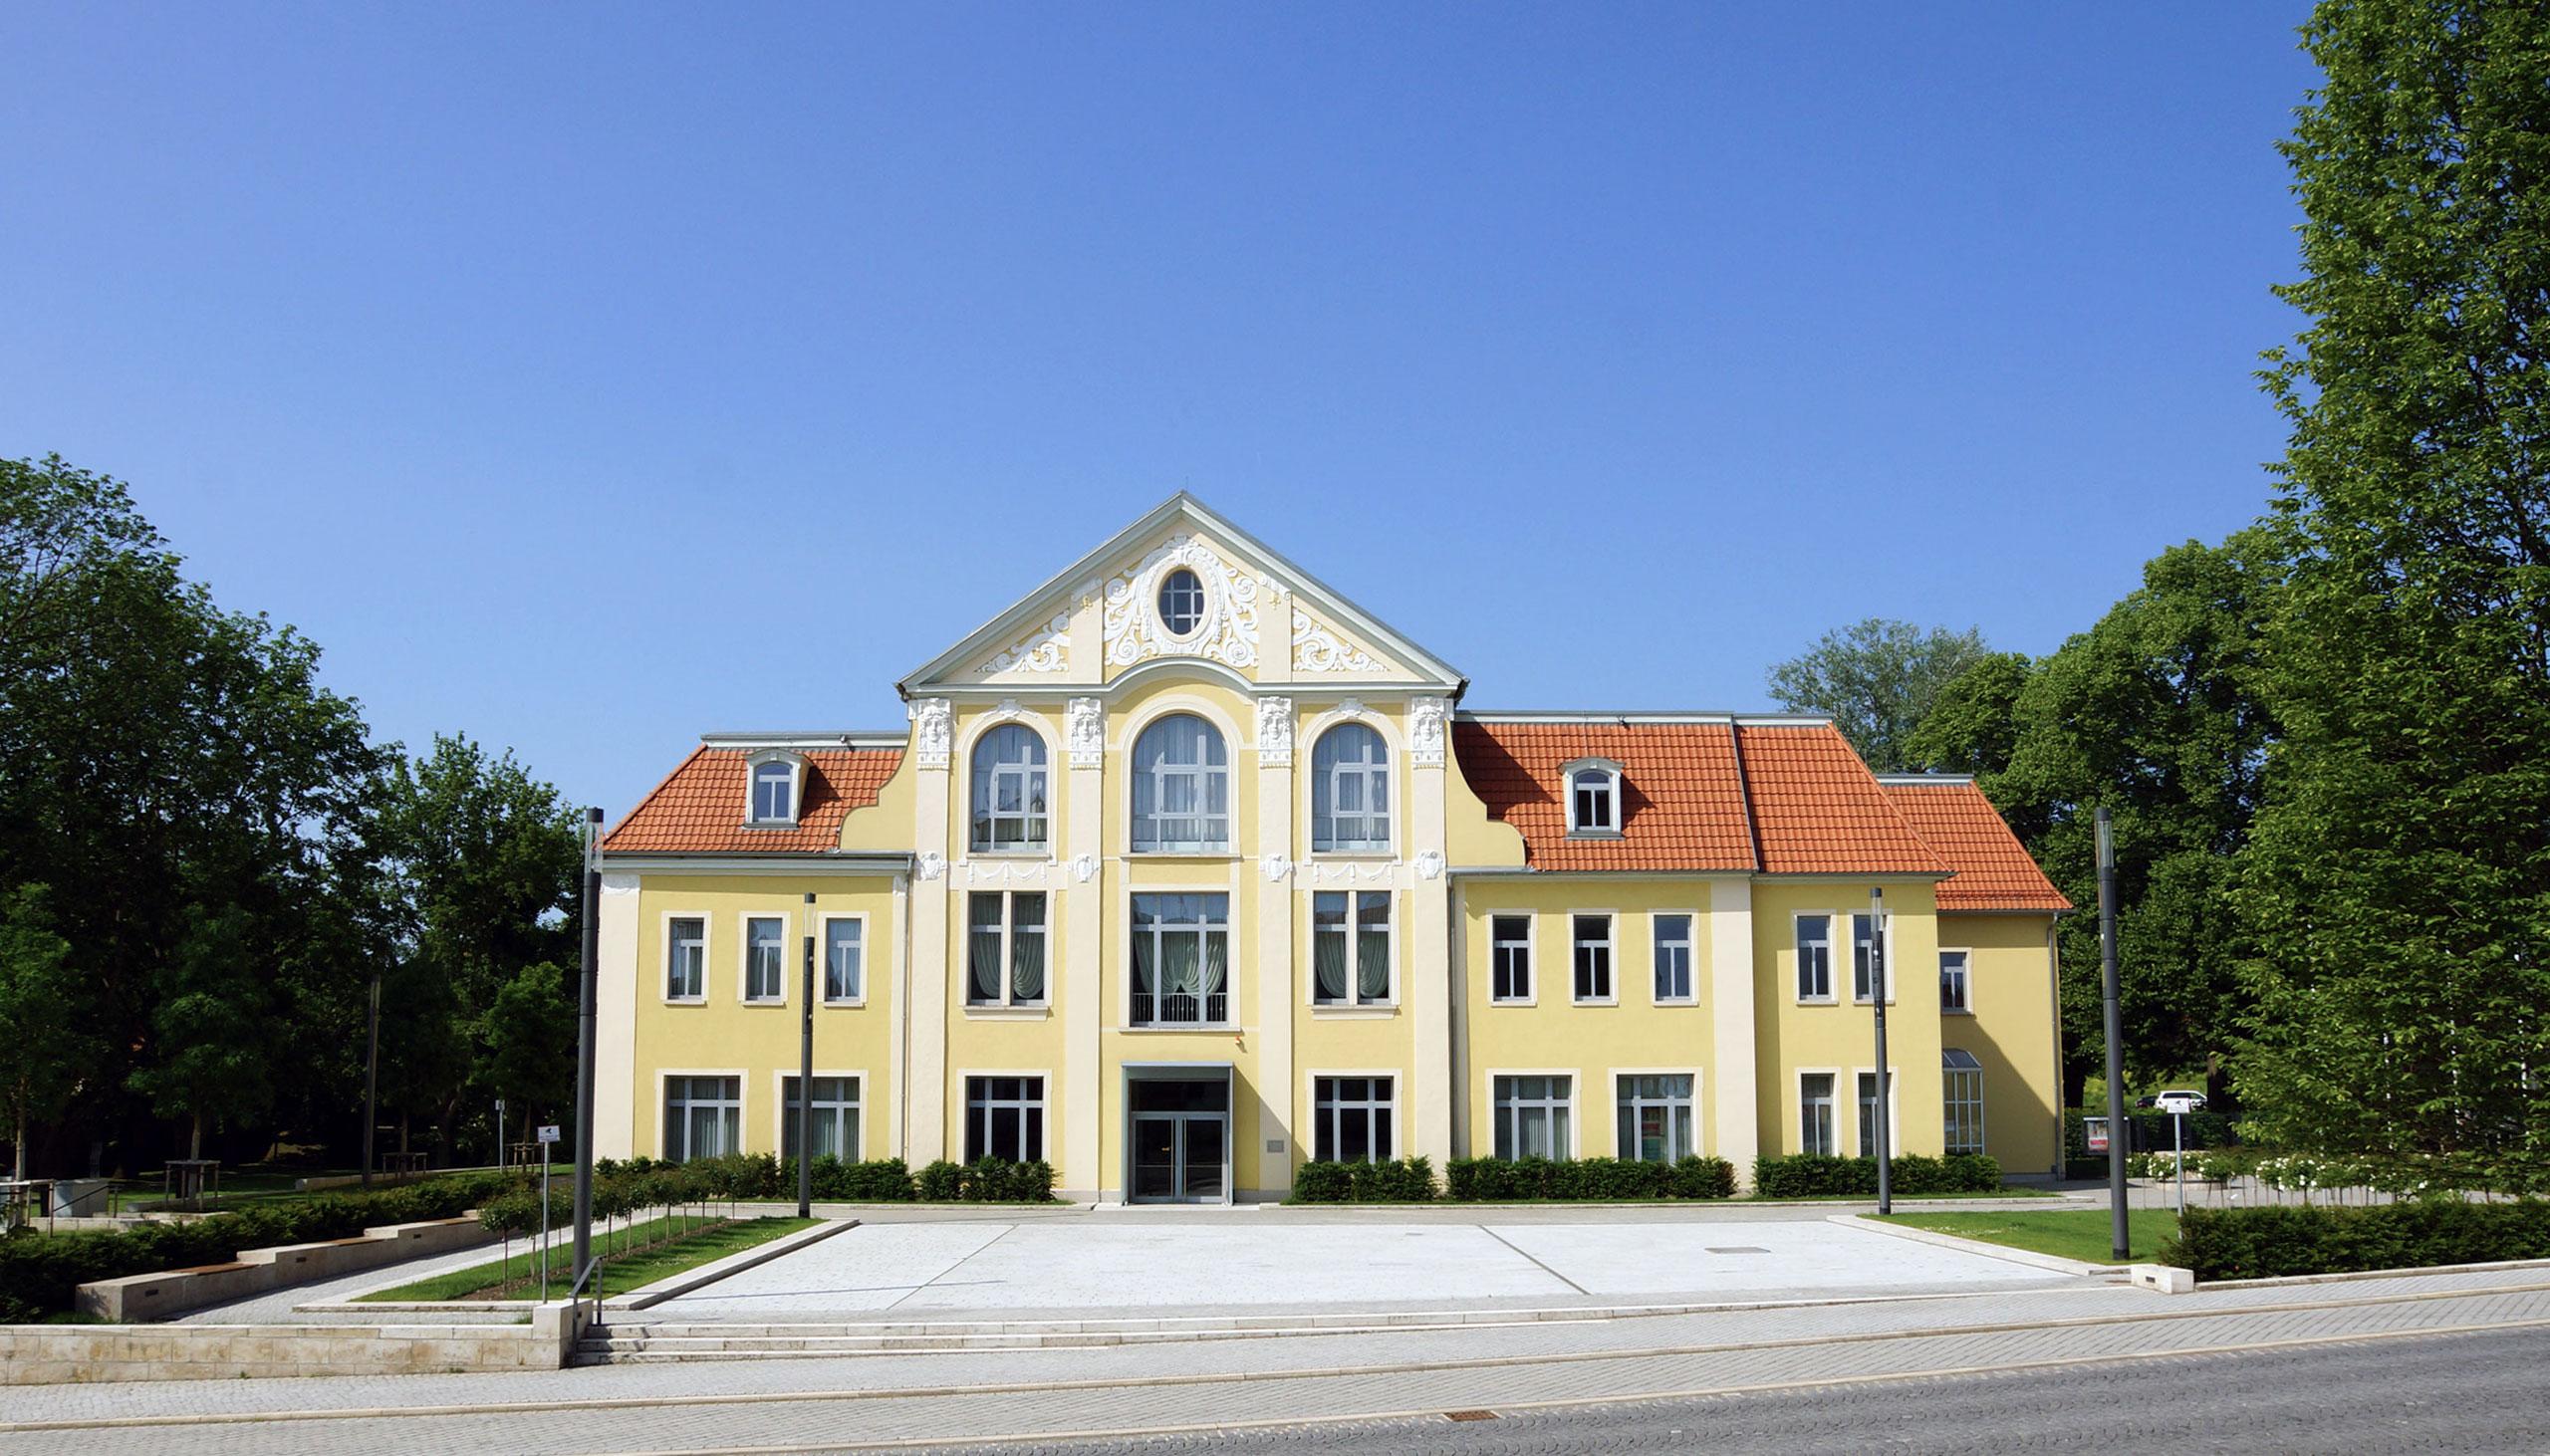 Kultur-Kongresszentrum Bad Langensalza